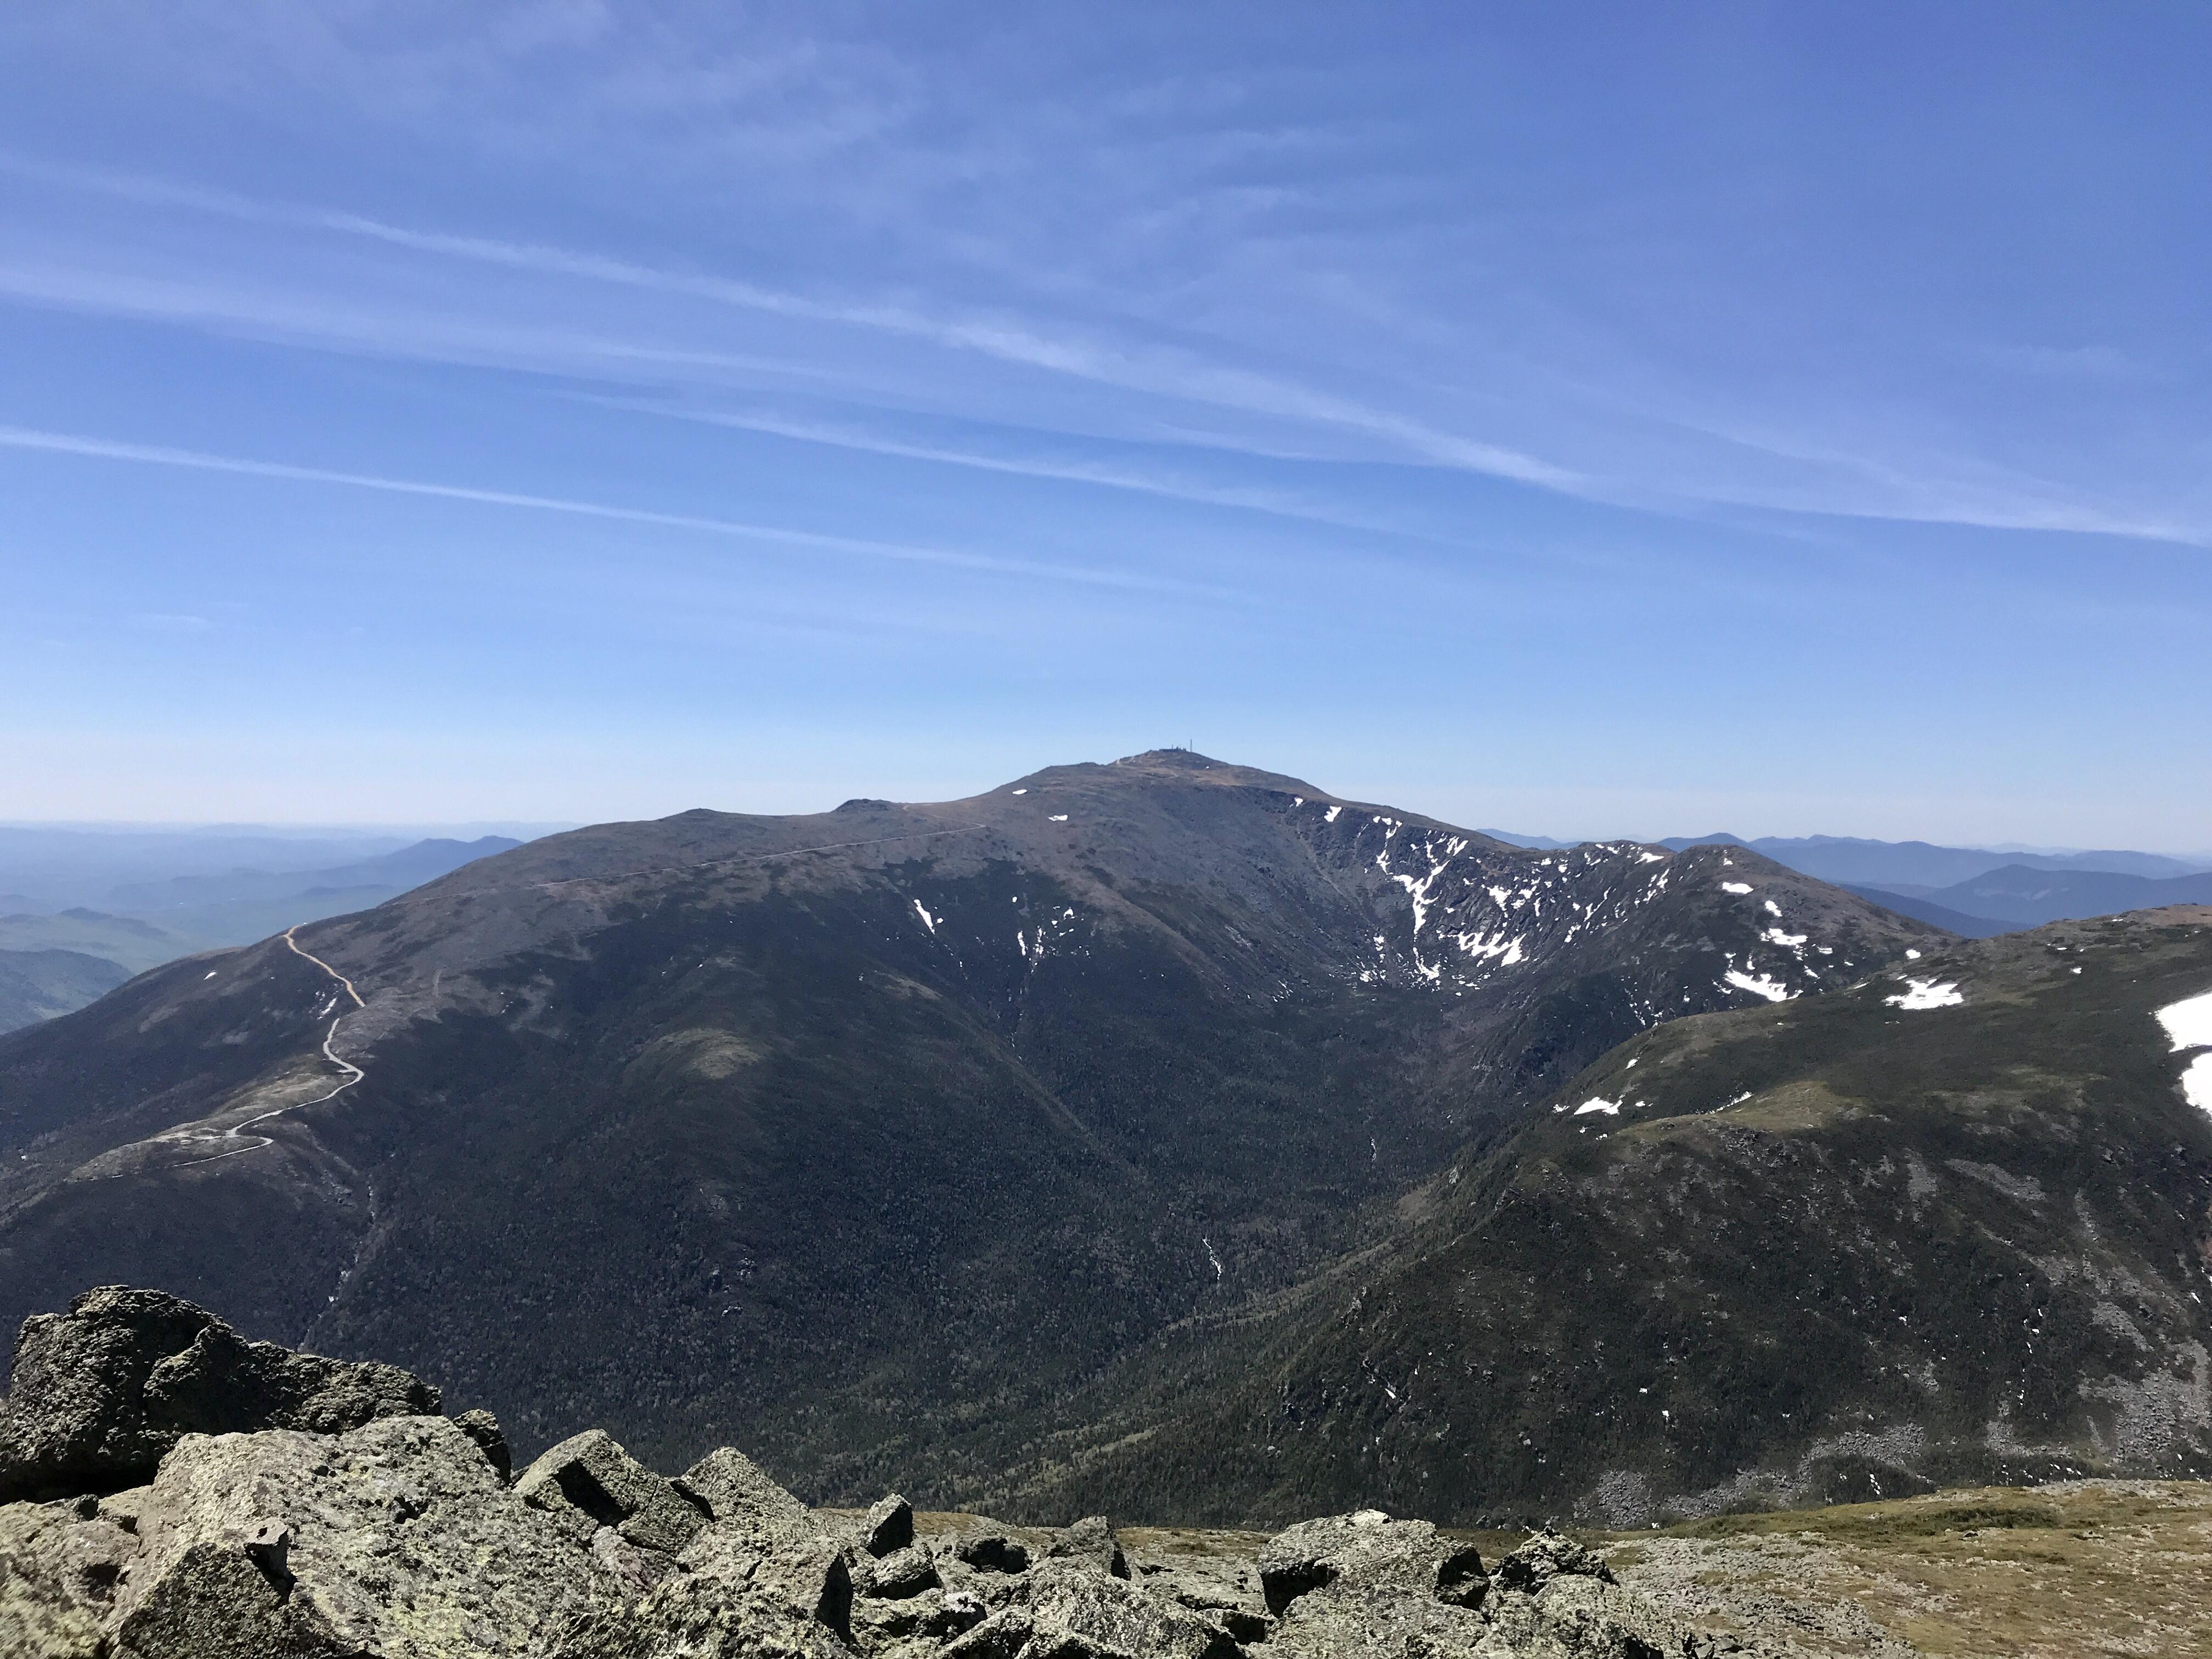 Maps Versus Apps for Backcountry Navigation - The Trek